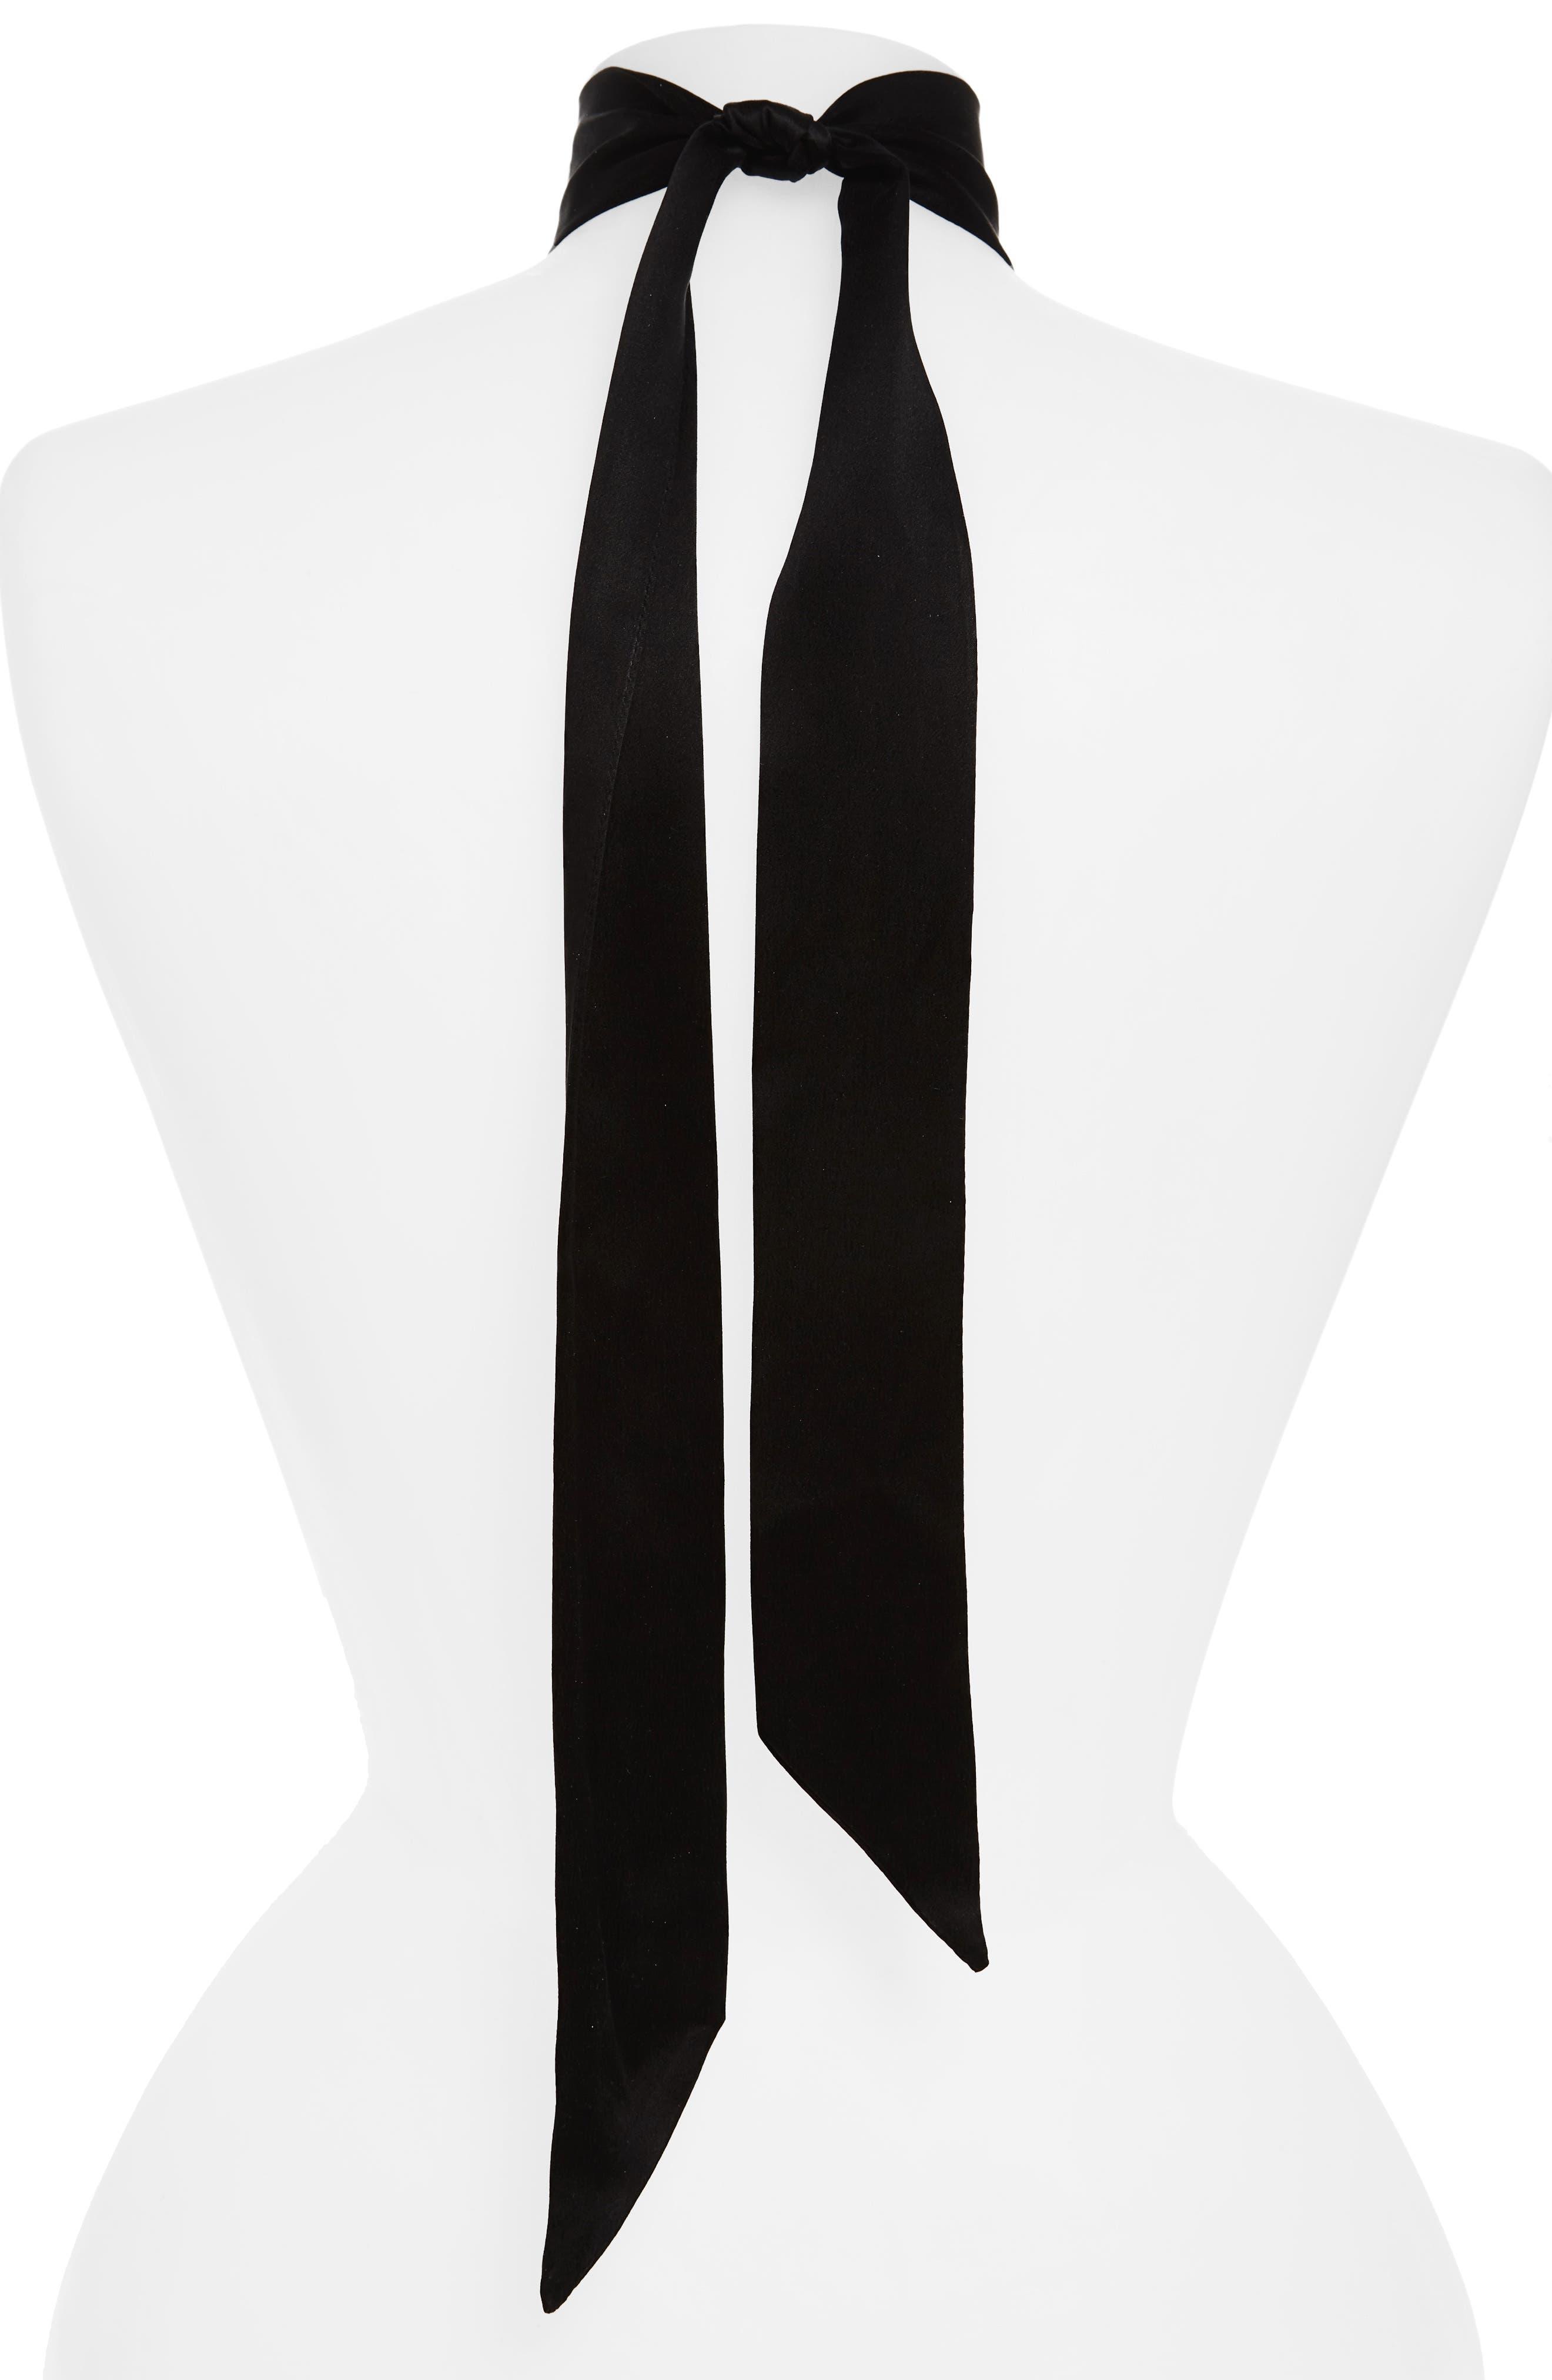 Good Vibes Embroidered Silk Ribbon Choker,                             Alternate thumbnail 2, color,                             001